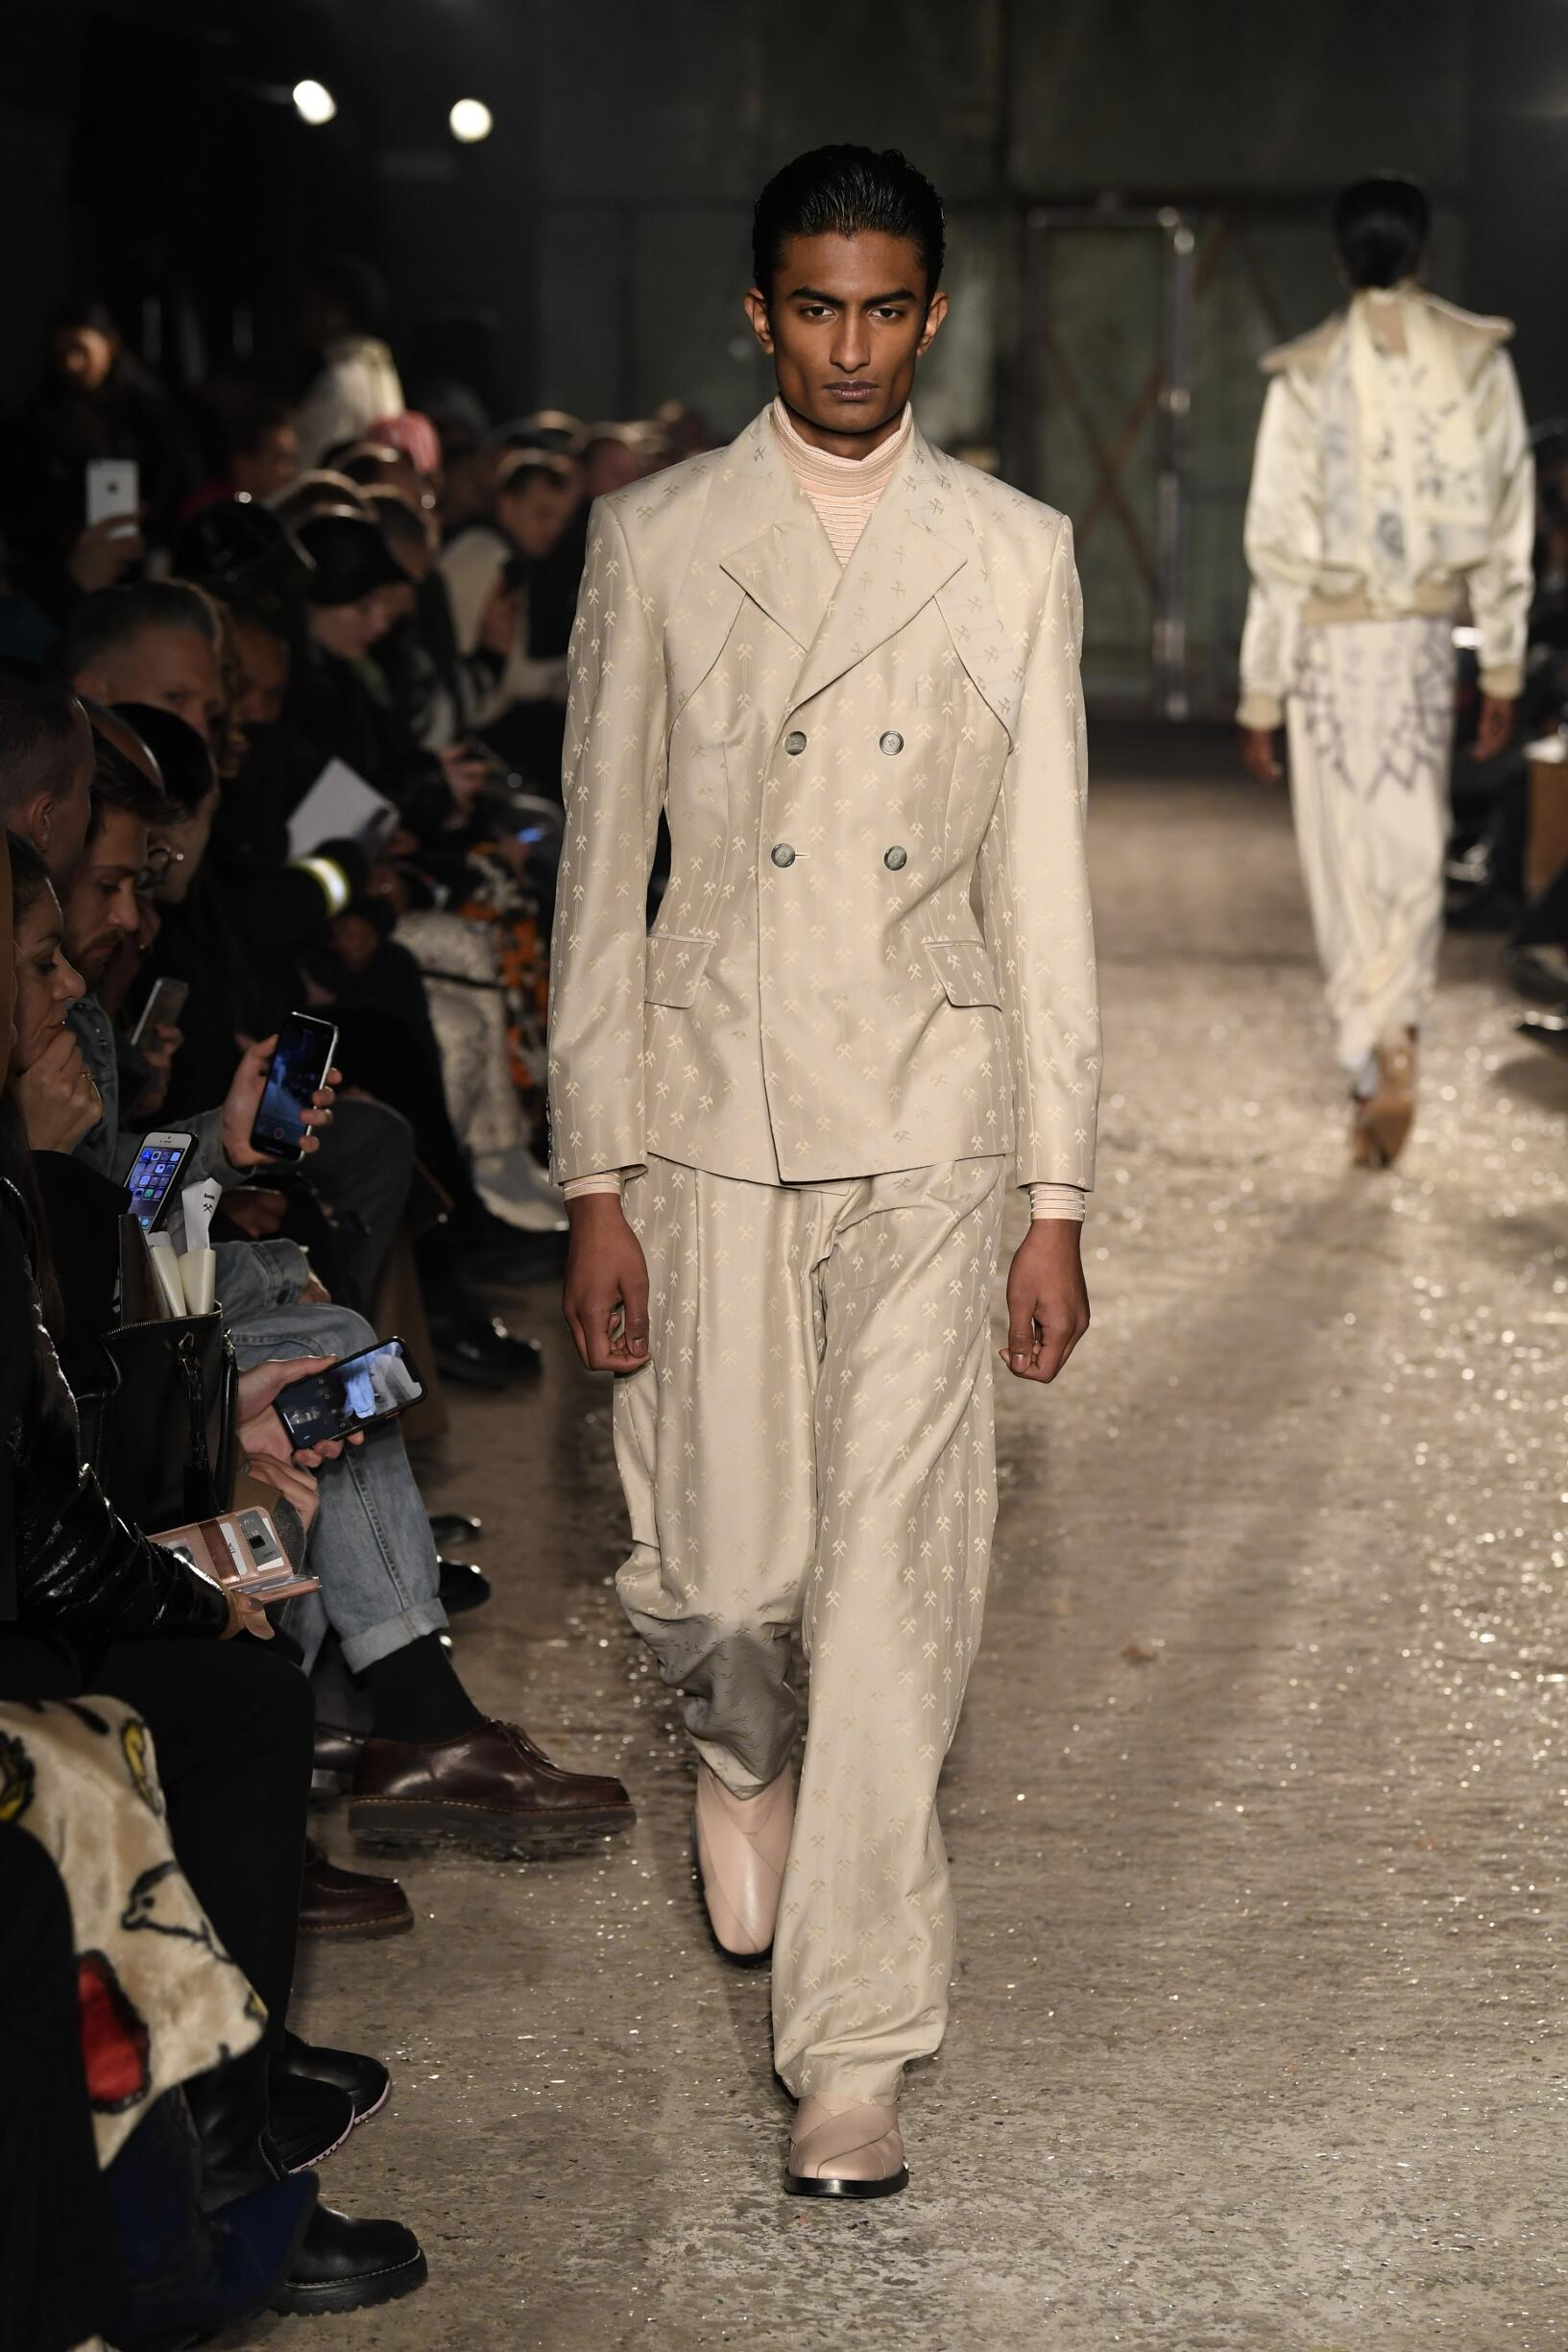 Fashion Show Man Model GMBH Catwalk